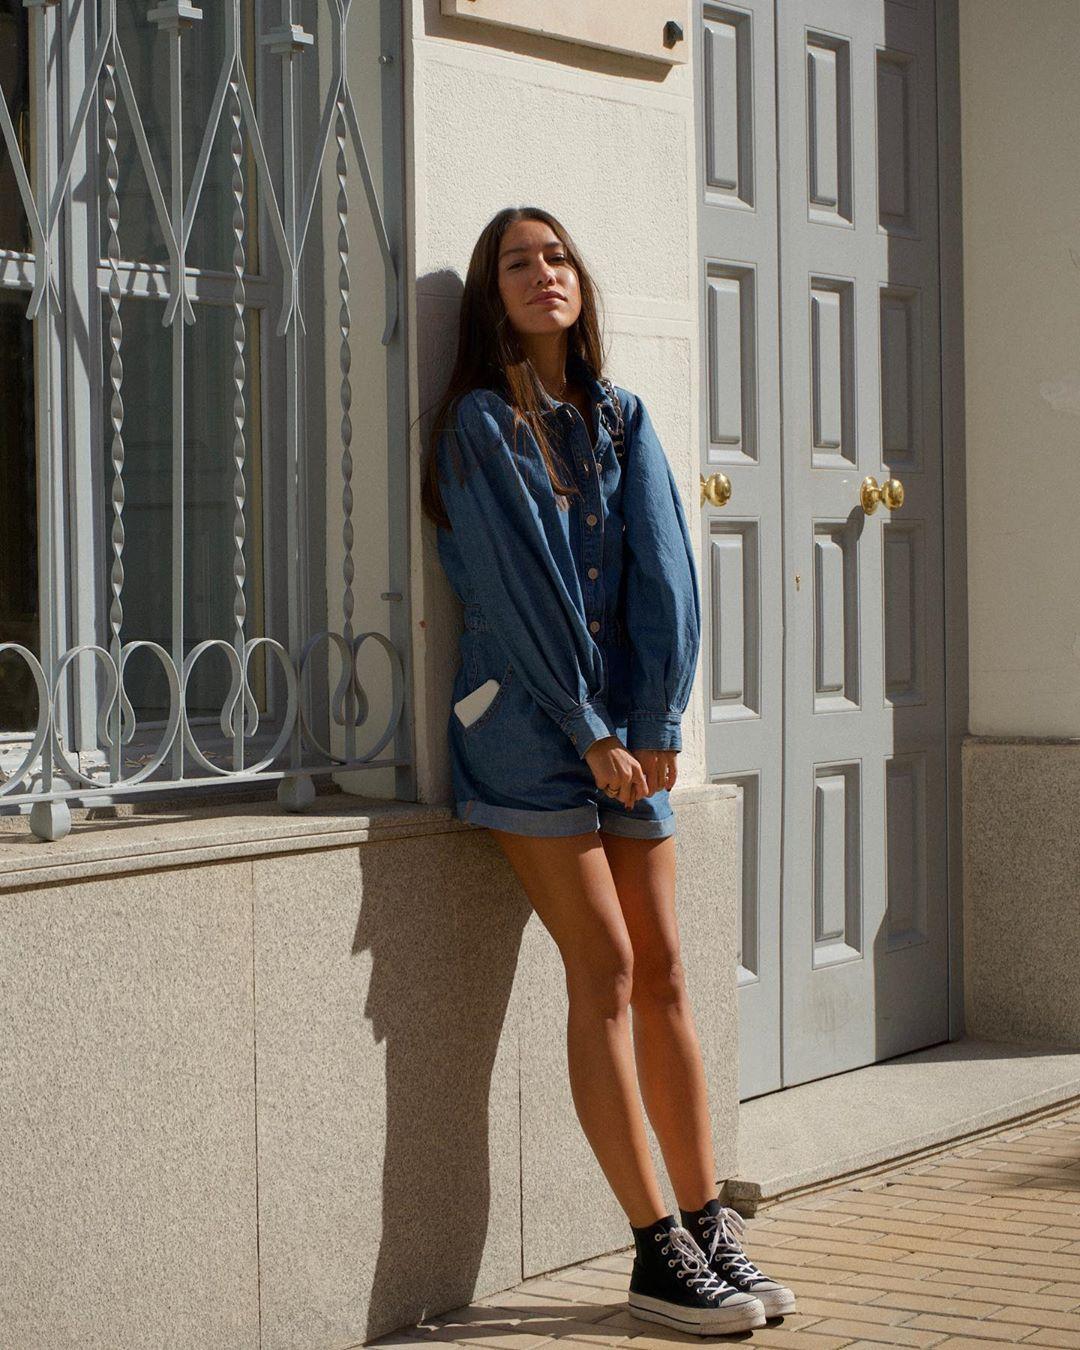 Melissa-Villarreal-Wallpapers-Insta-Fit-Bio-3